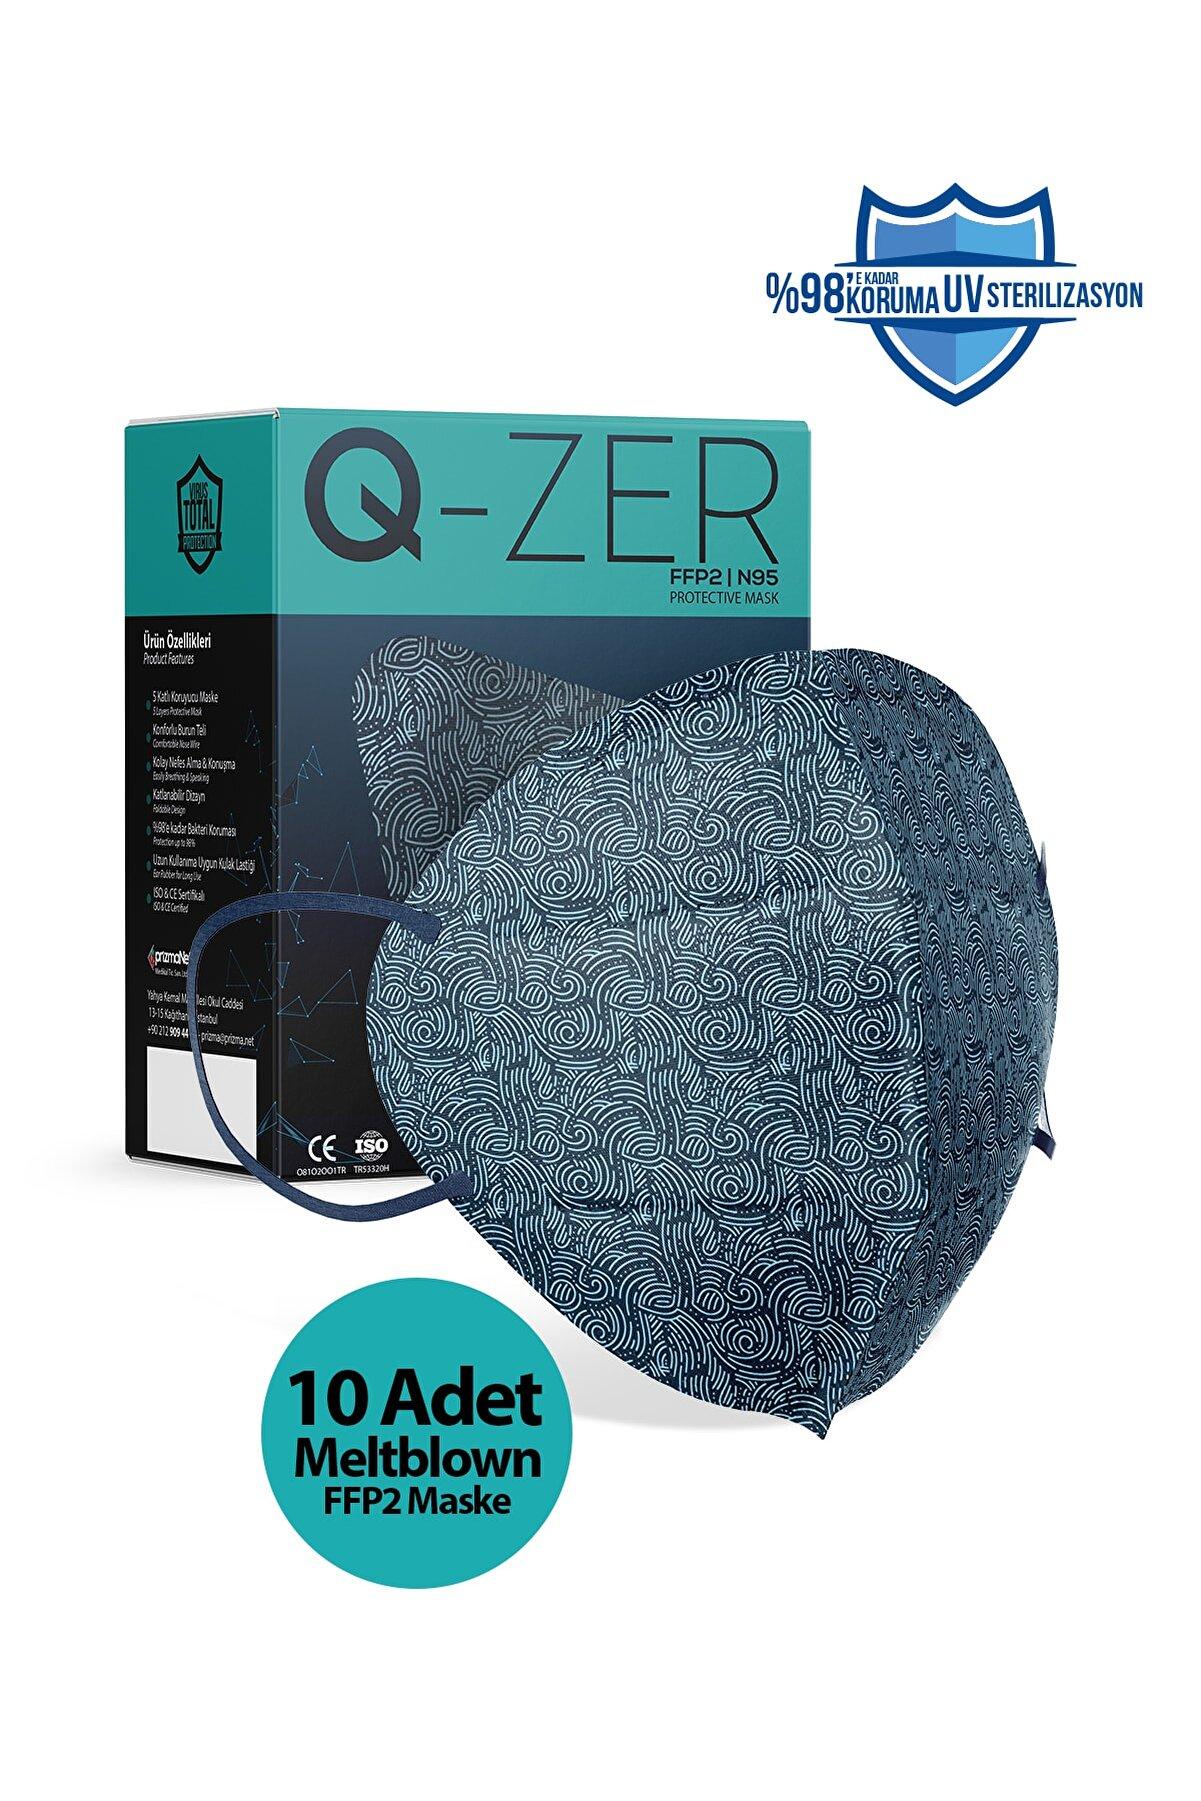 Medizer Qzer Lacivert Dalga Desenli N95 Maske 10 Adet